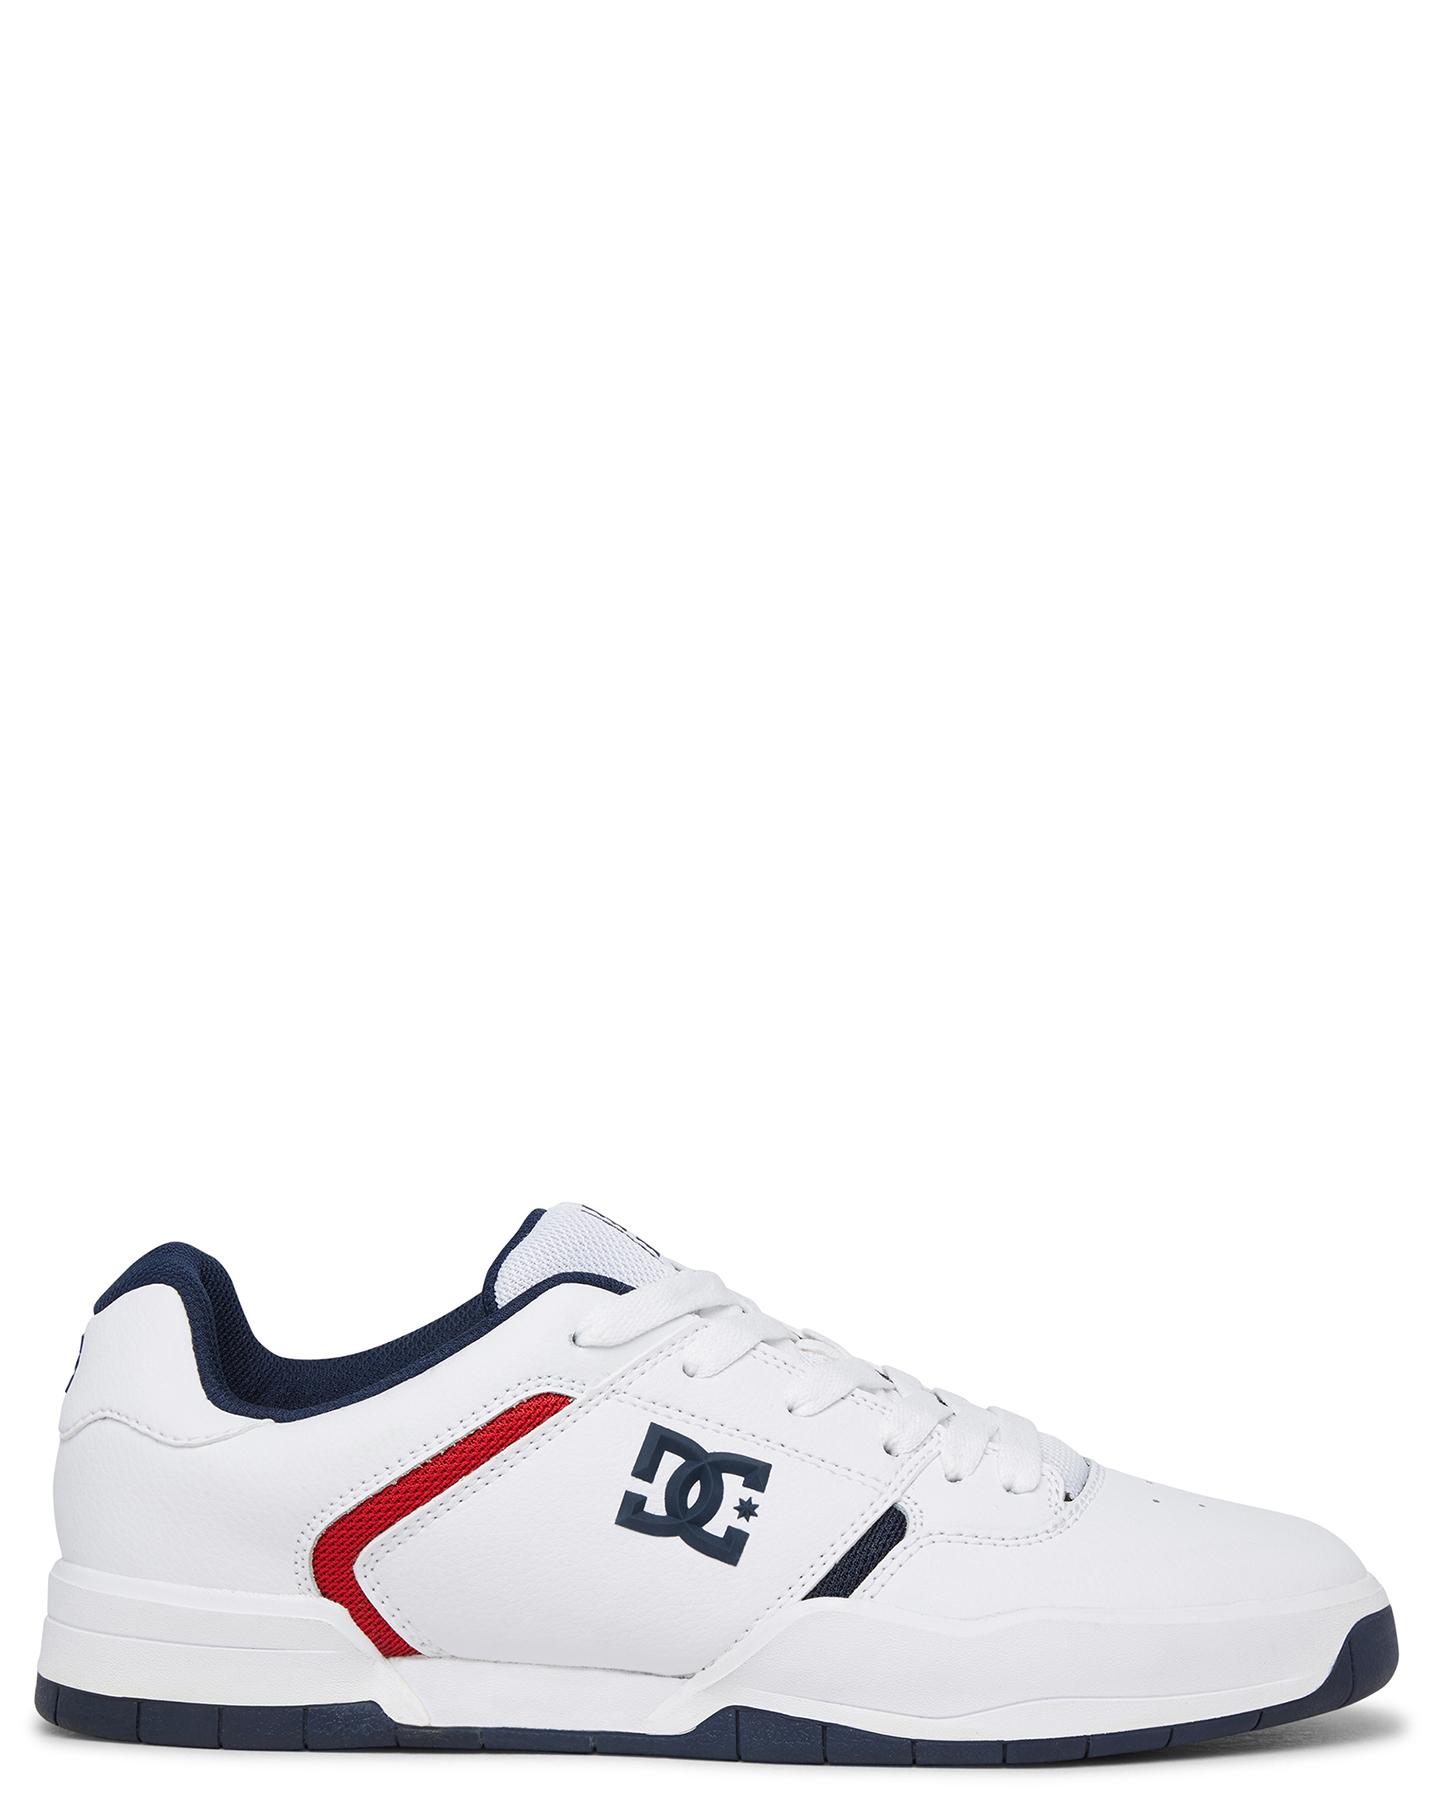 Dc Shoes Mens Central Shoe - White